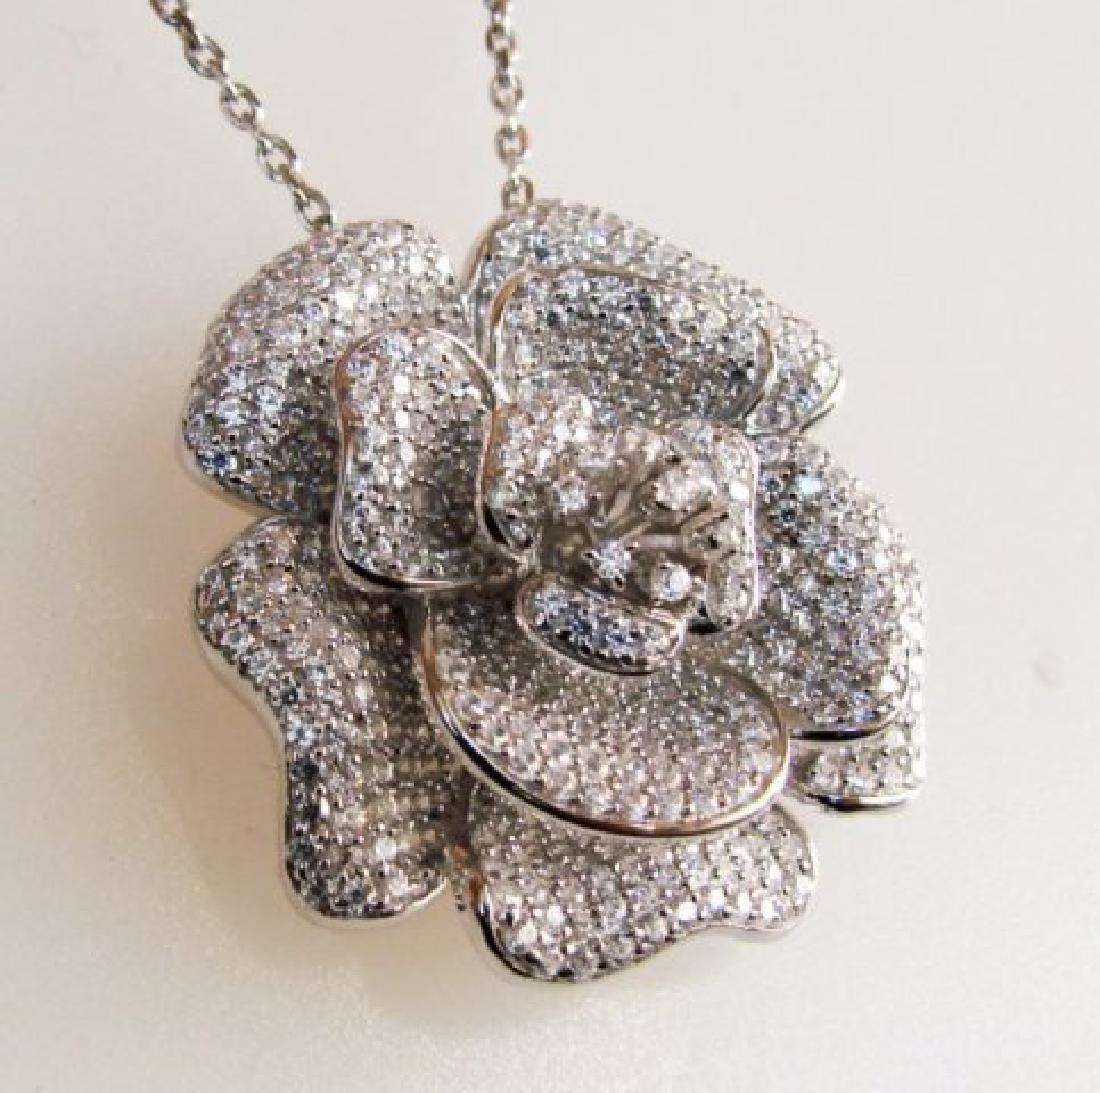 Creation Diamond Flower Pendant 3.87Ct 18k W/g Overlay - 2